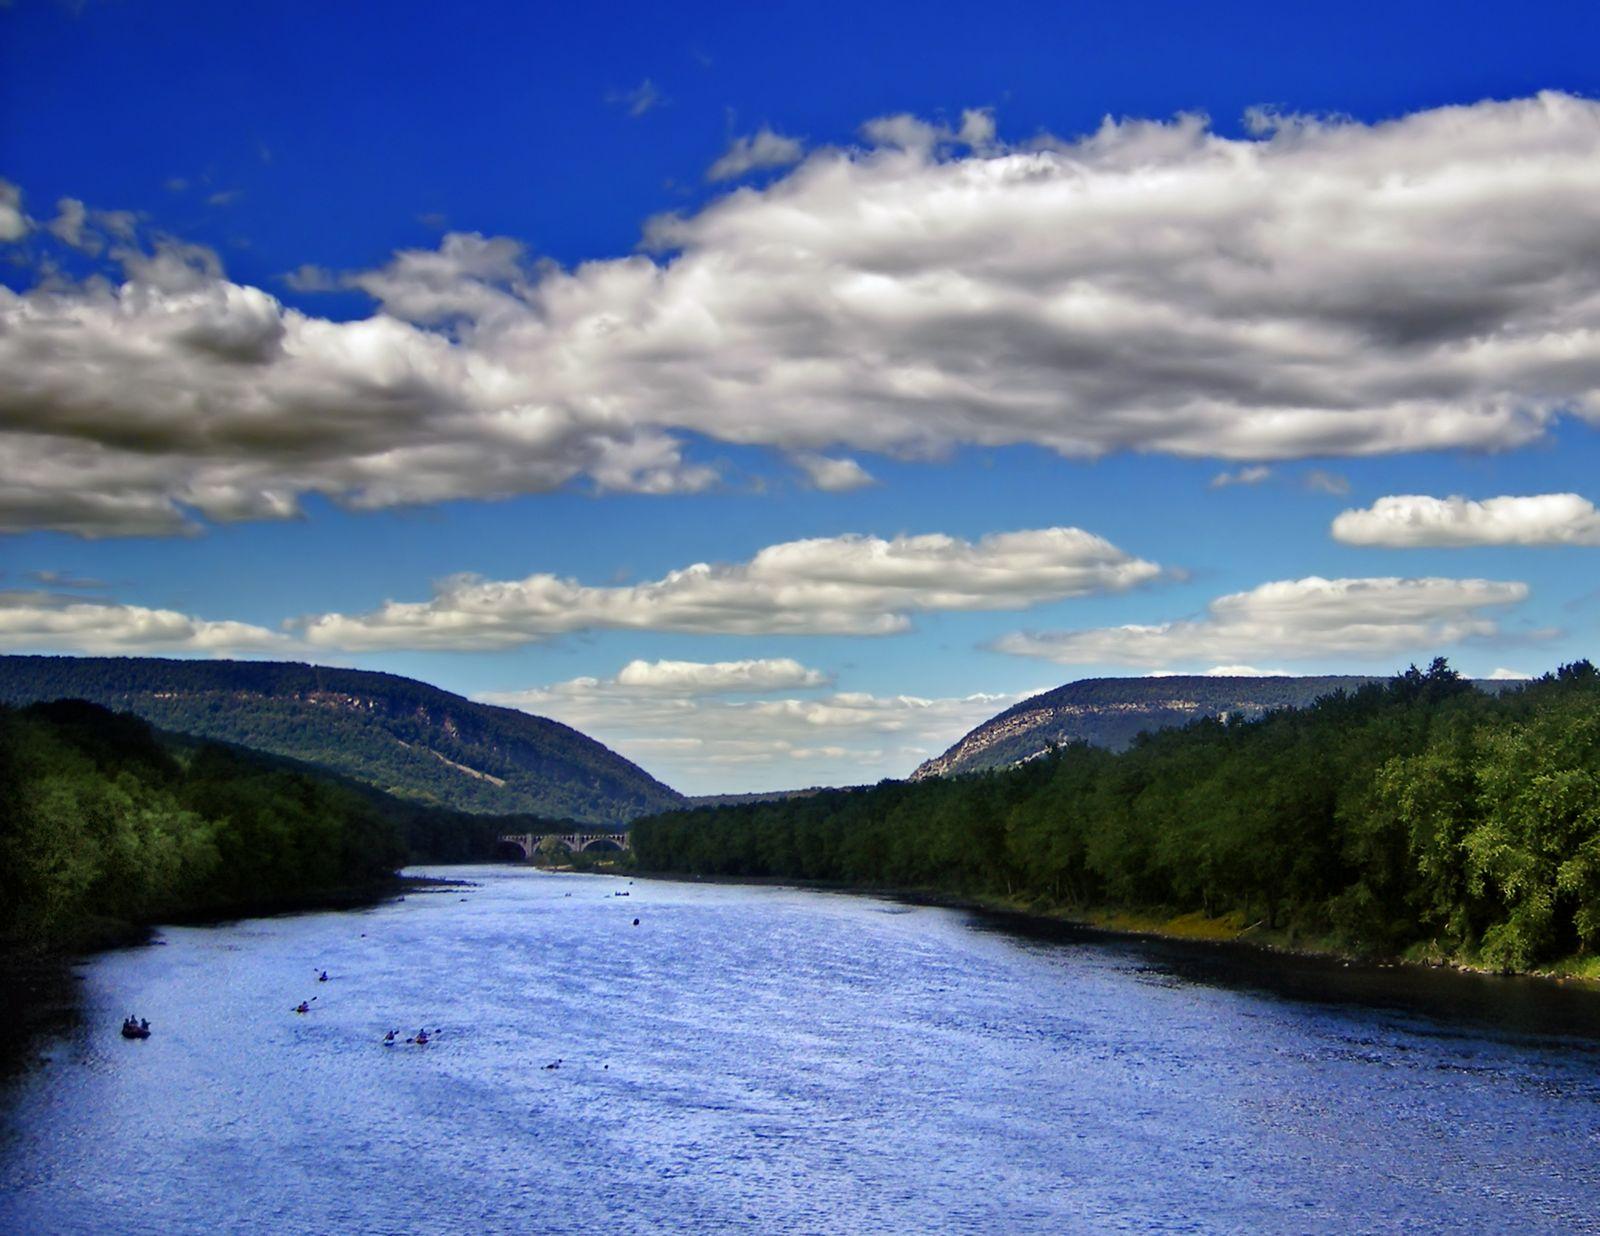 Restoring the Paulins Kill River